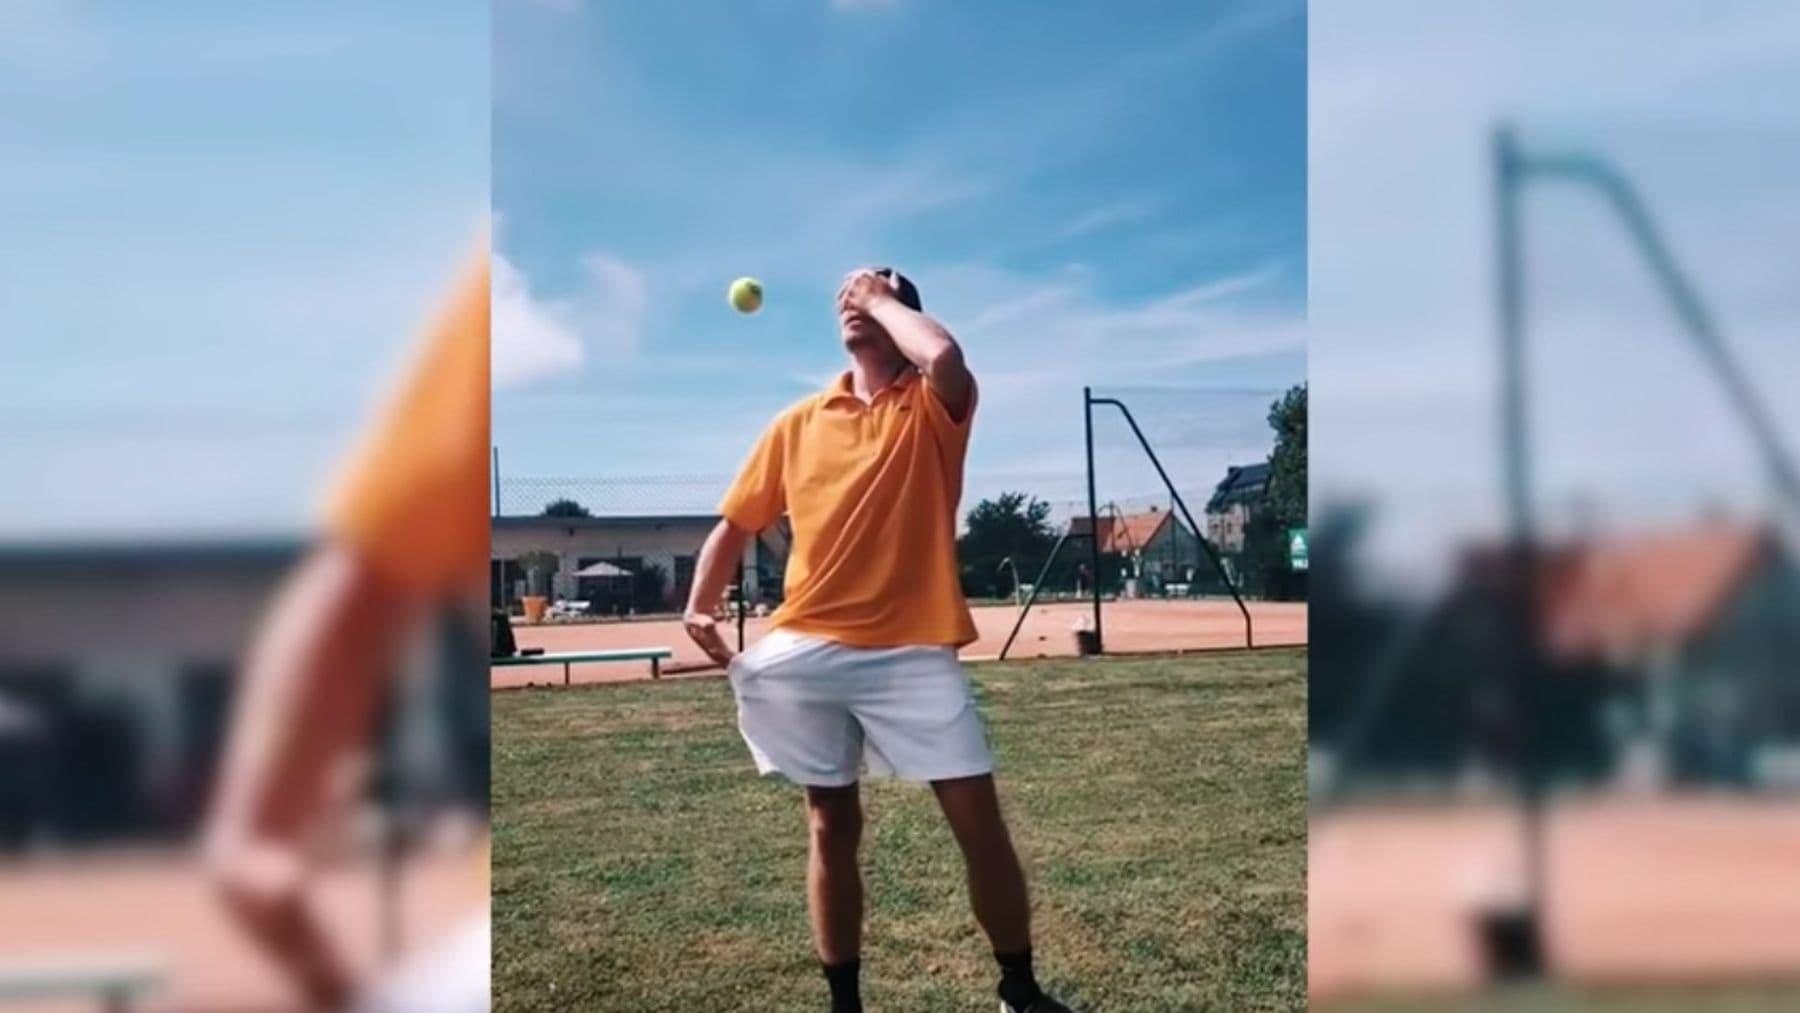 Coole Tennis-Trickshots | Awesome | Was is hier eigentlich los?